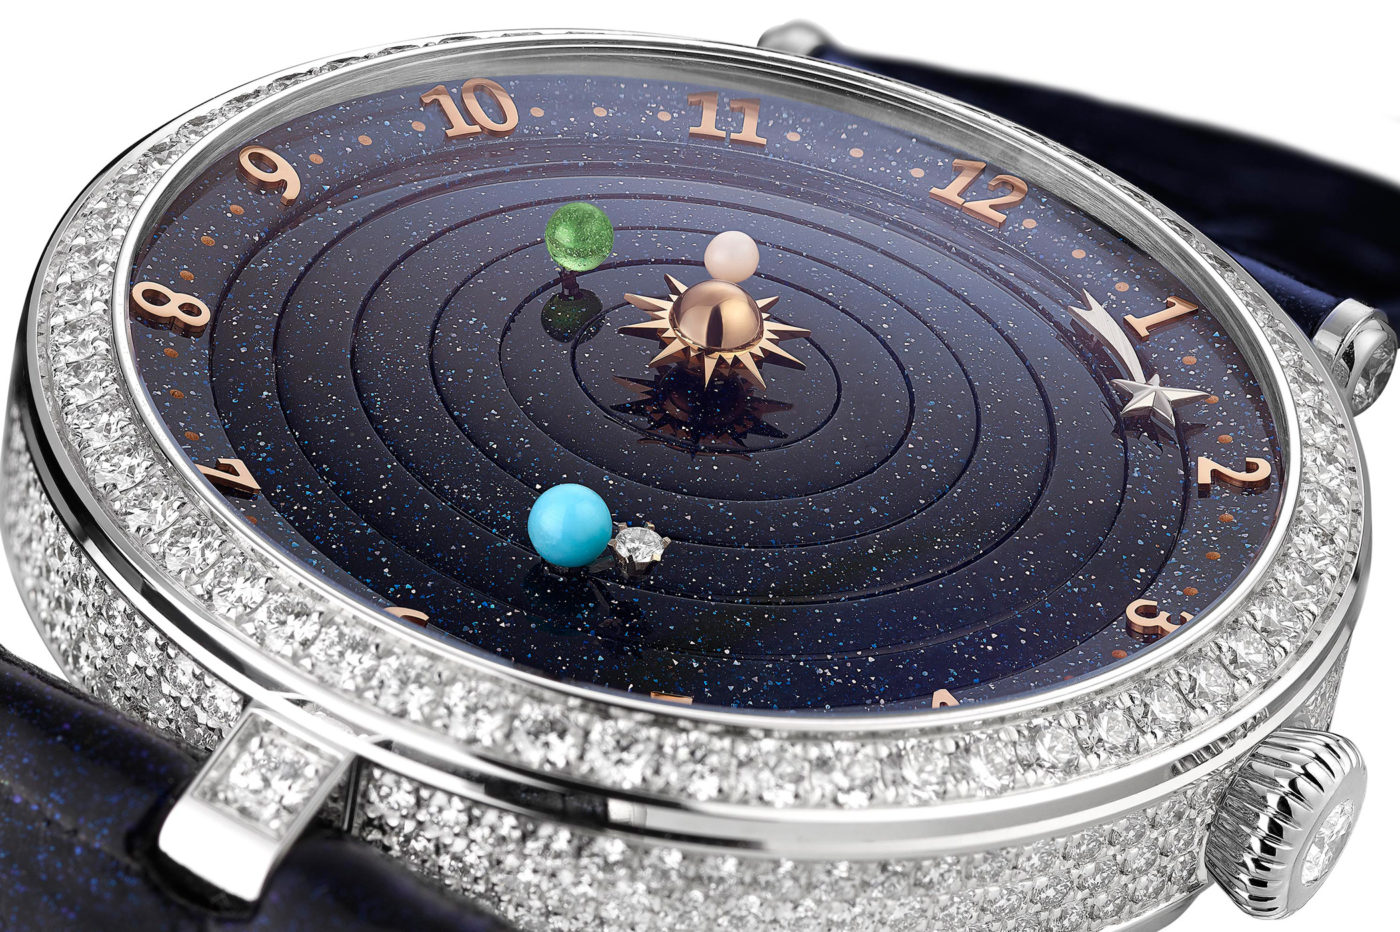 Van Cleef & Arpels Lady Arpels Planétarium – SIHH 2018